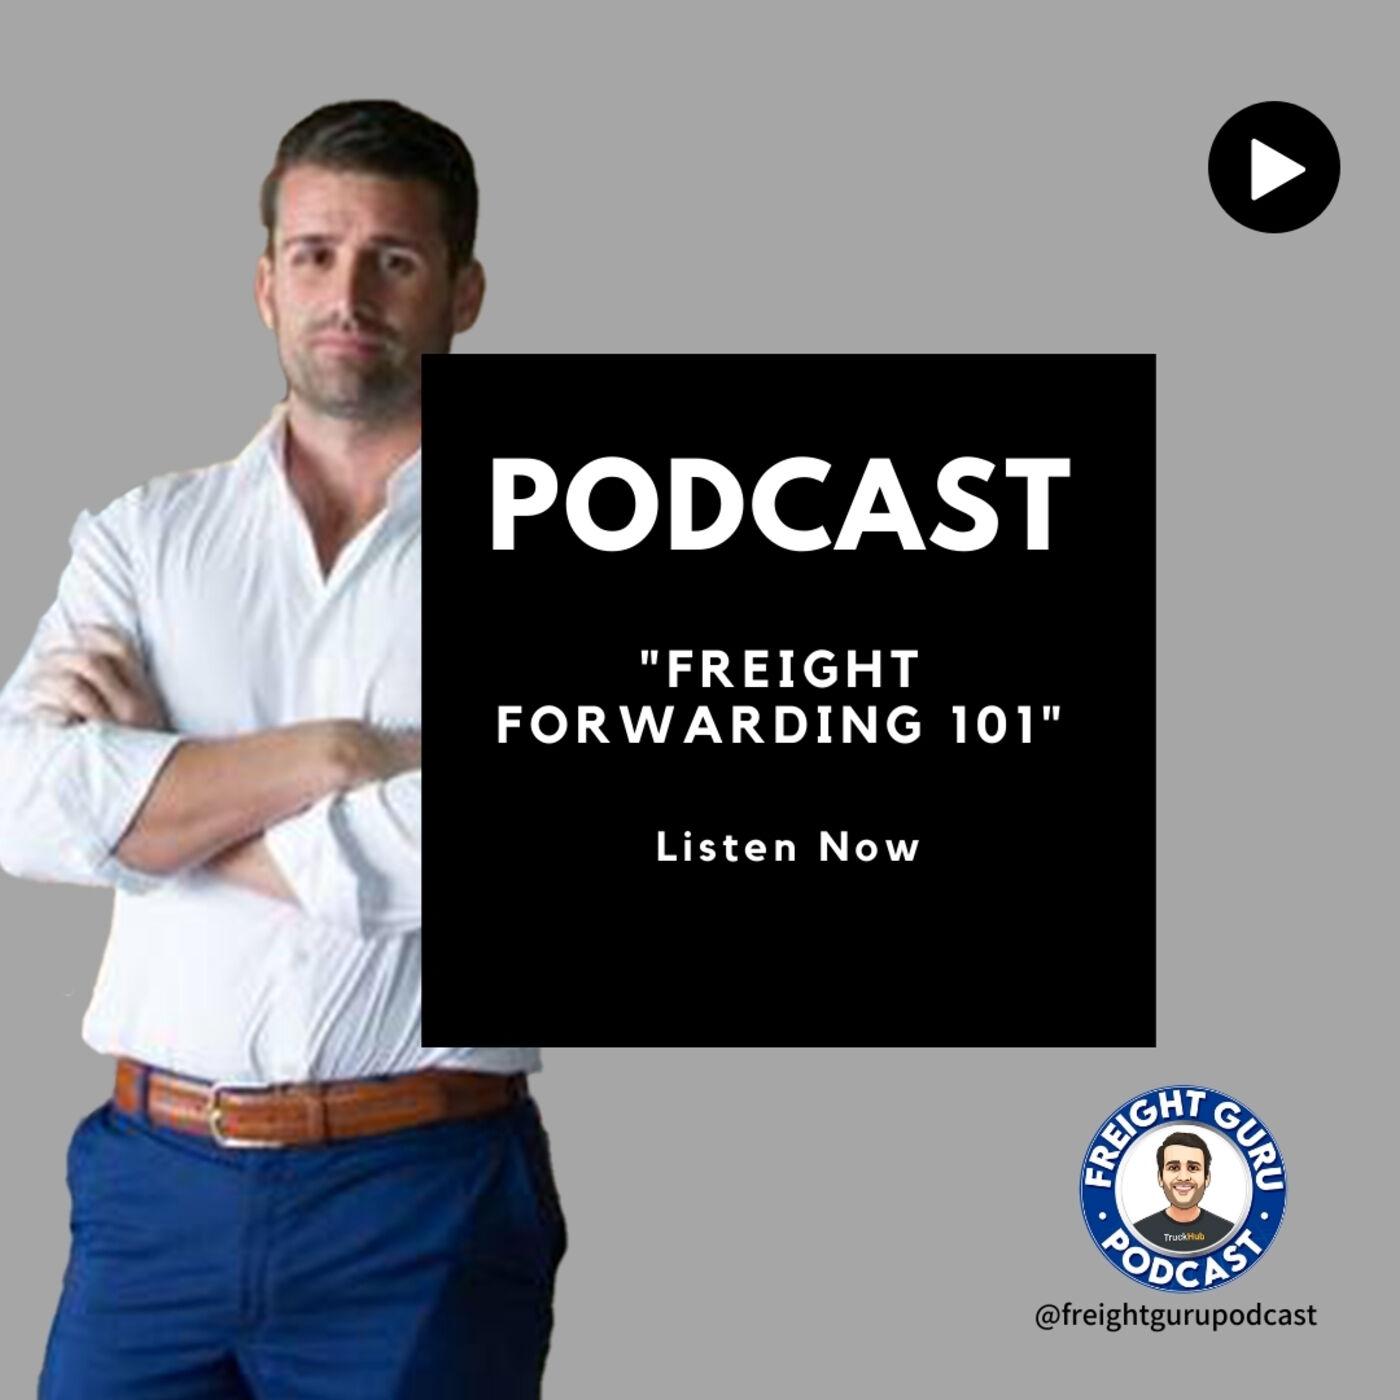 Freight Forwarding 101 - Freight Guru Podcast Ep. 14 PART 1